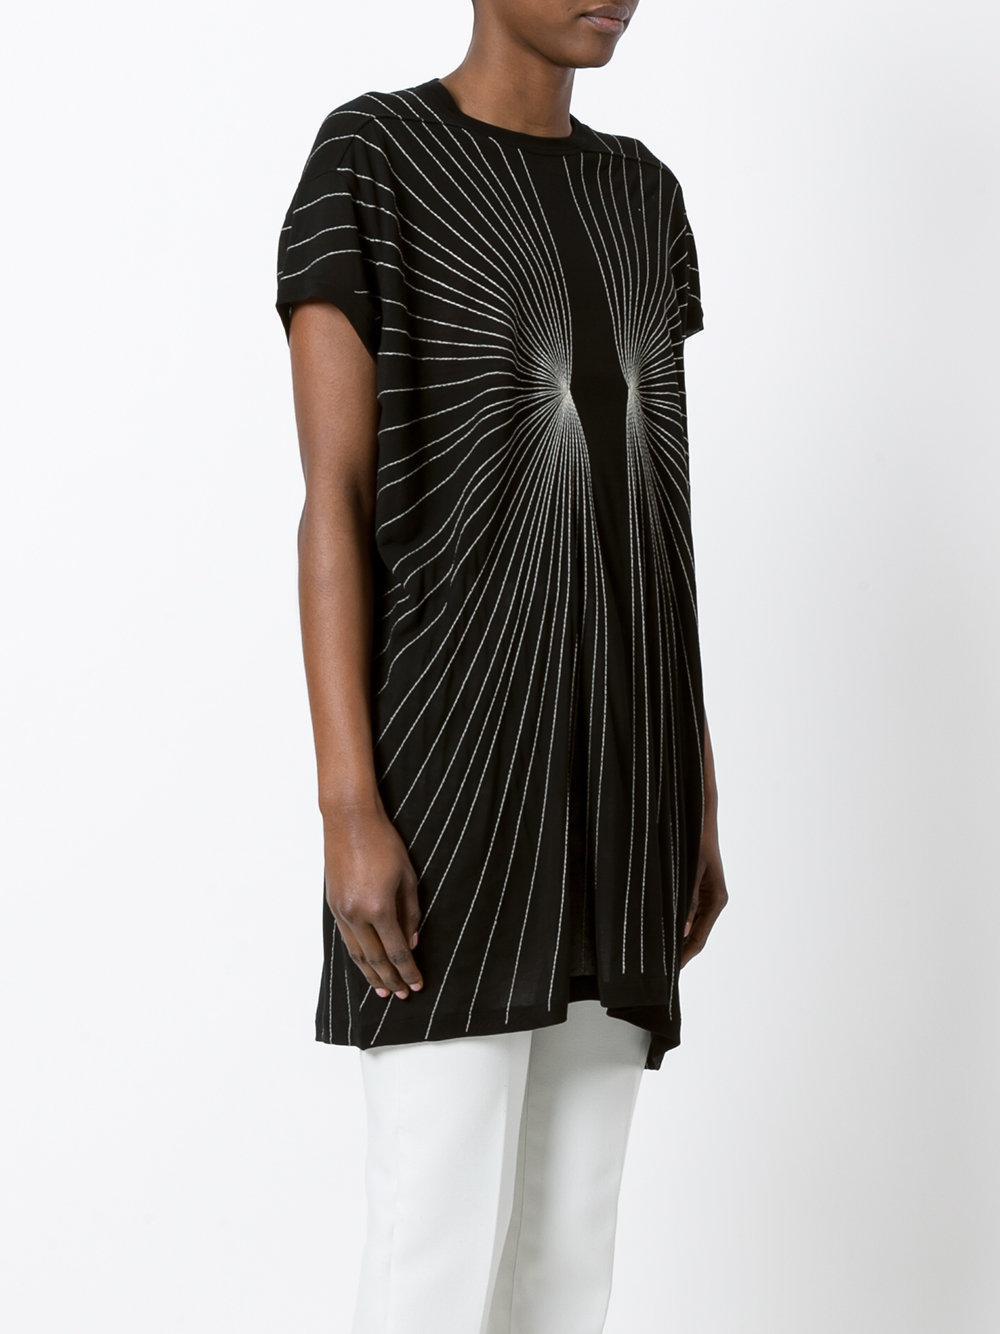 Affordable Cheap Online Pre Order Cheap Price stitch detailed T-shirt - Black Rick Owens Outlet Original opoLGtNj